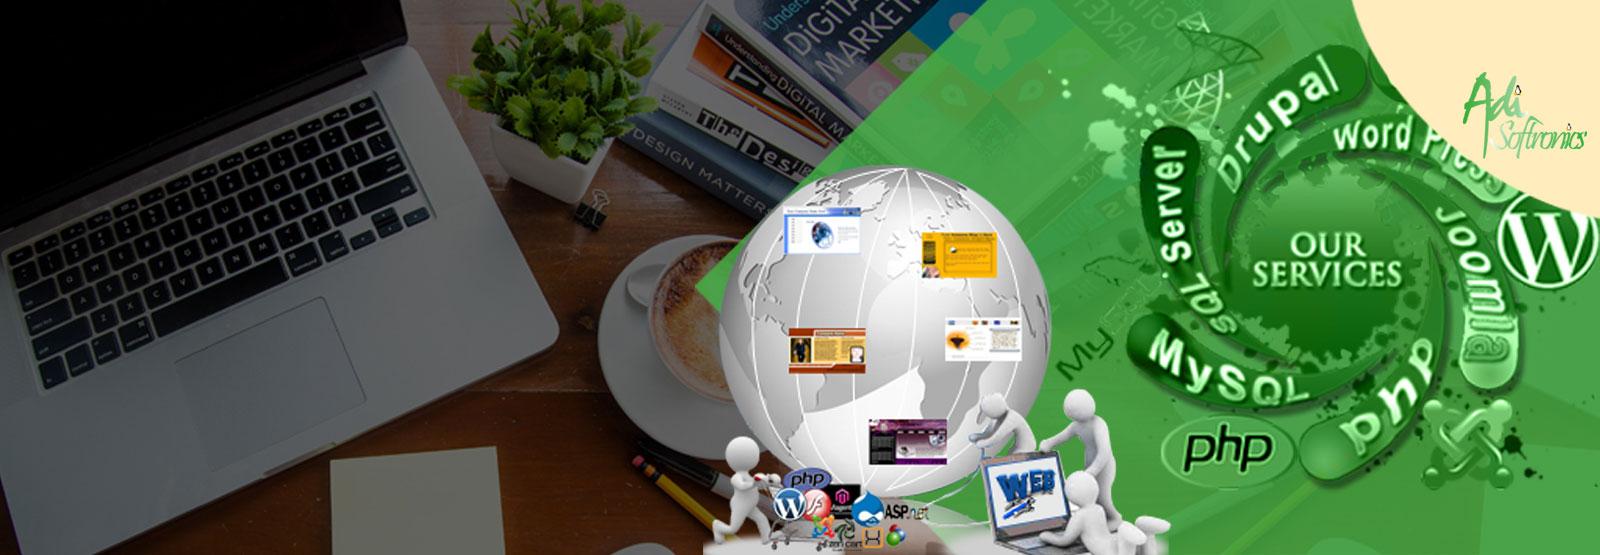 Website Designing and Development in Delhi - Adisoftronics